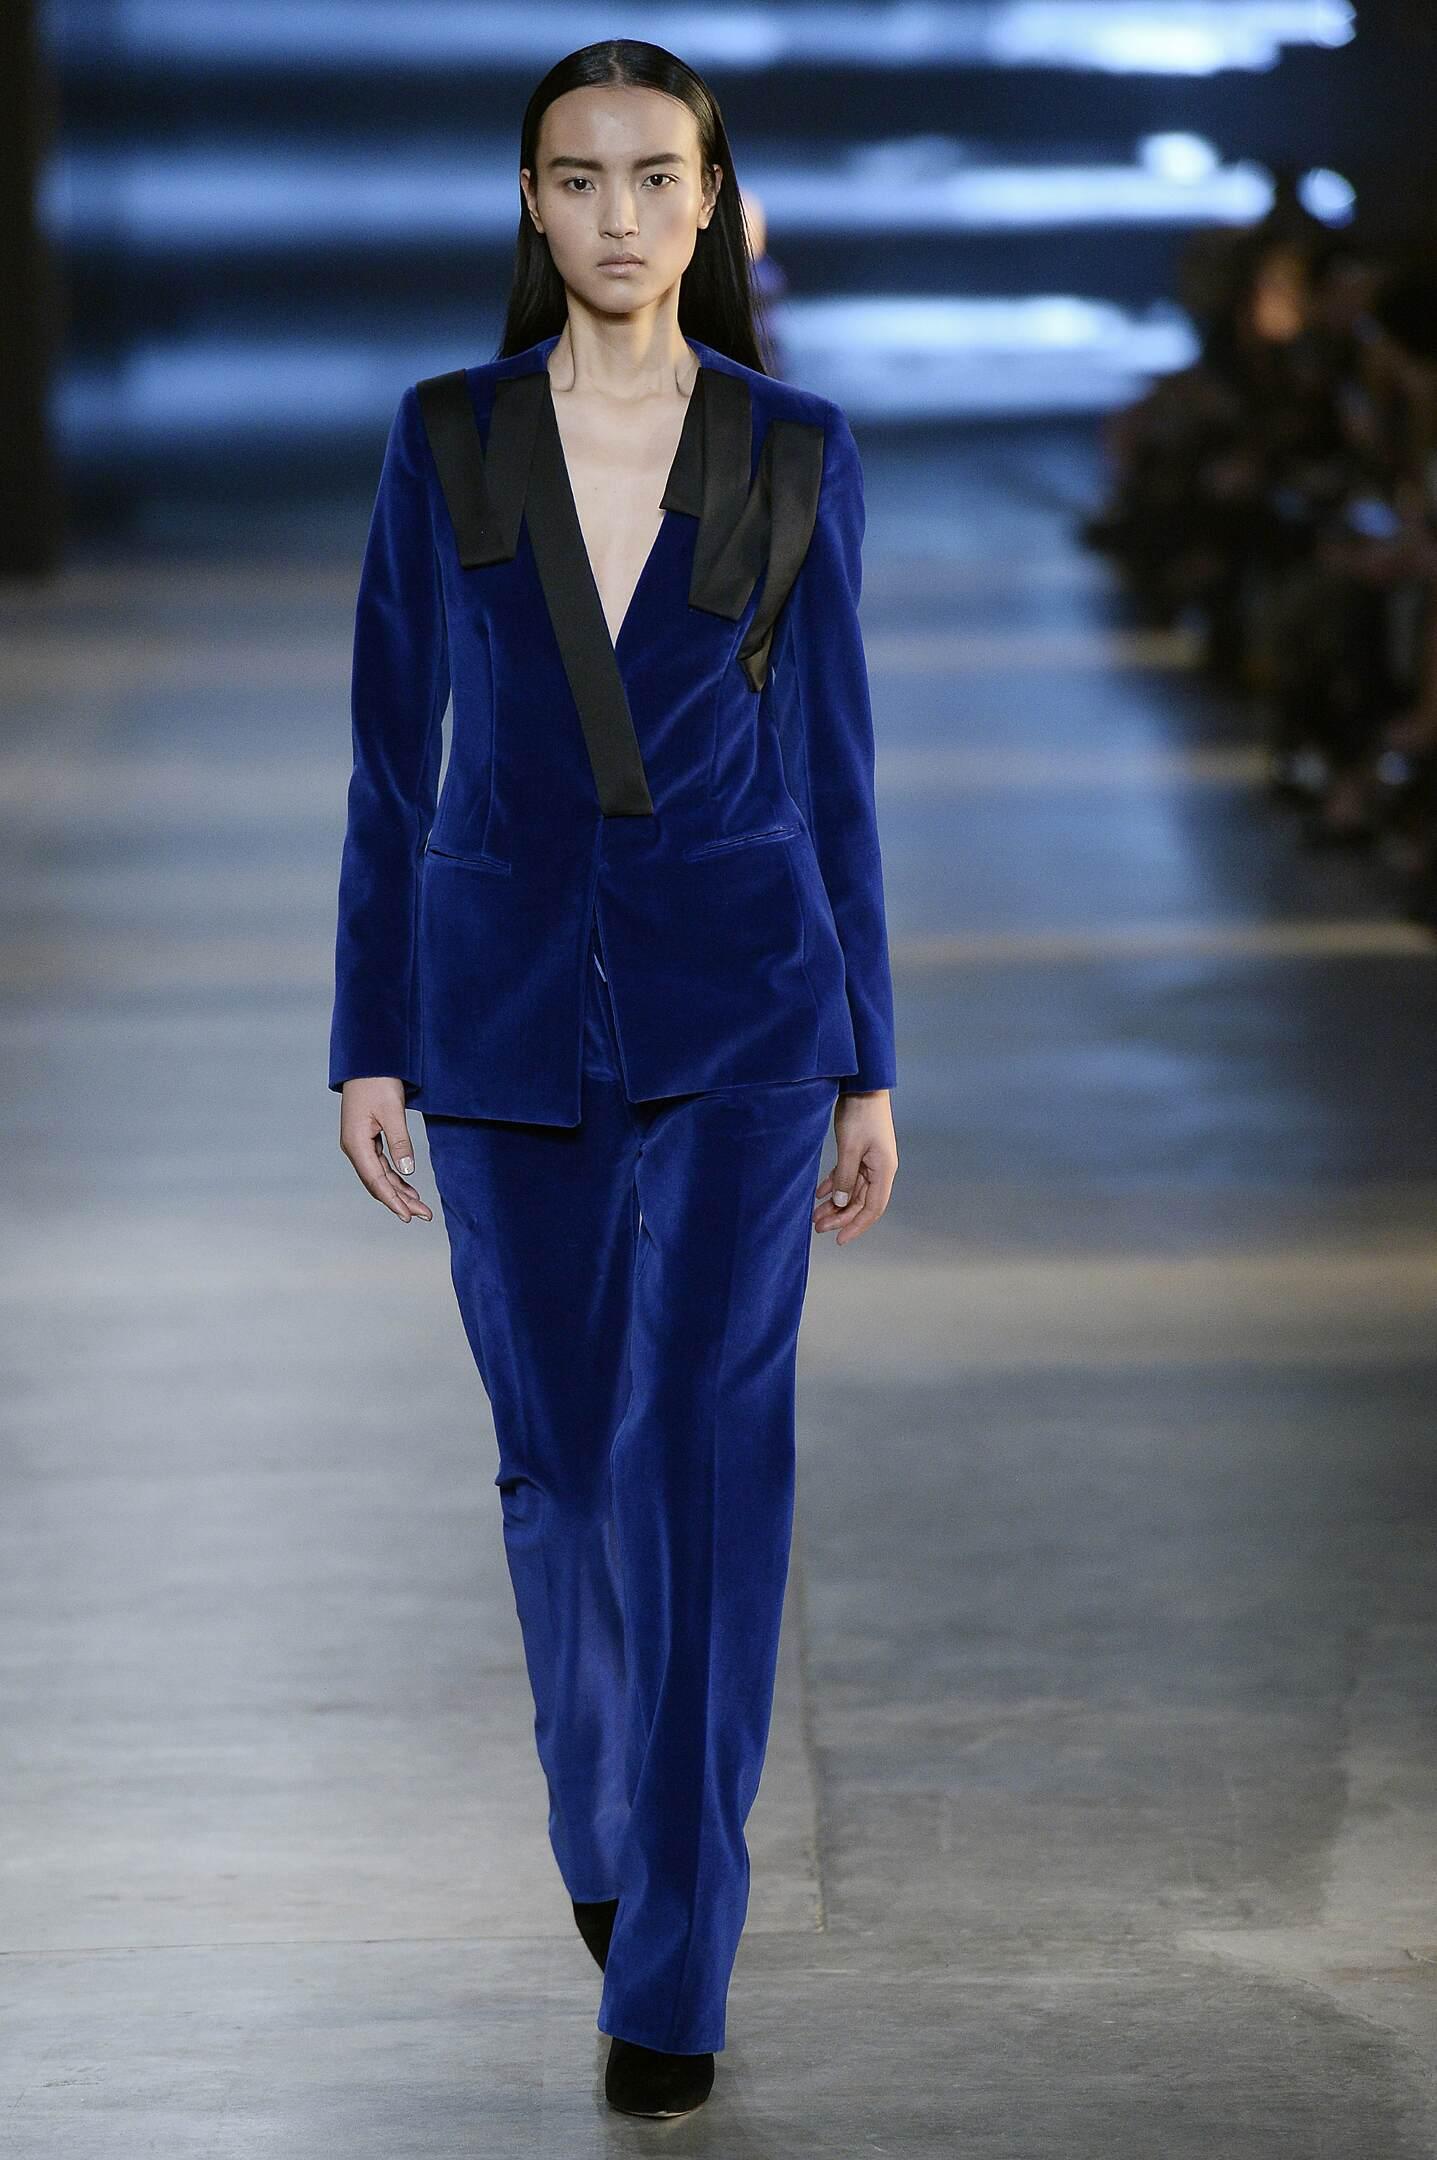 Runway Christopher Kane Fall Winter 2015 16 Women's Collection London Fashion Week